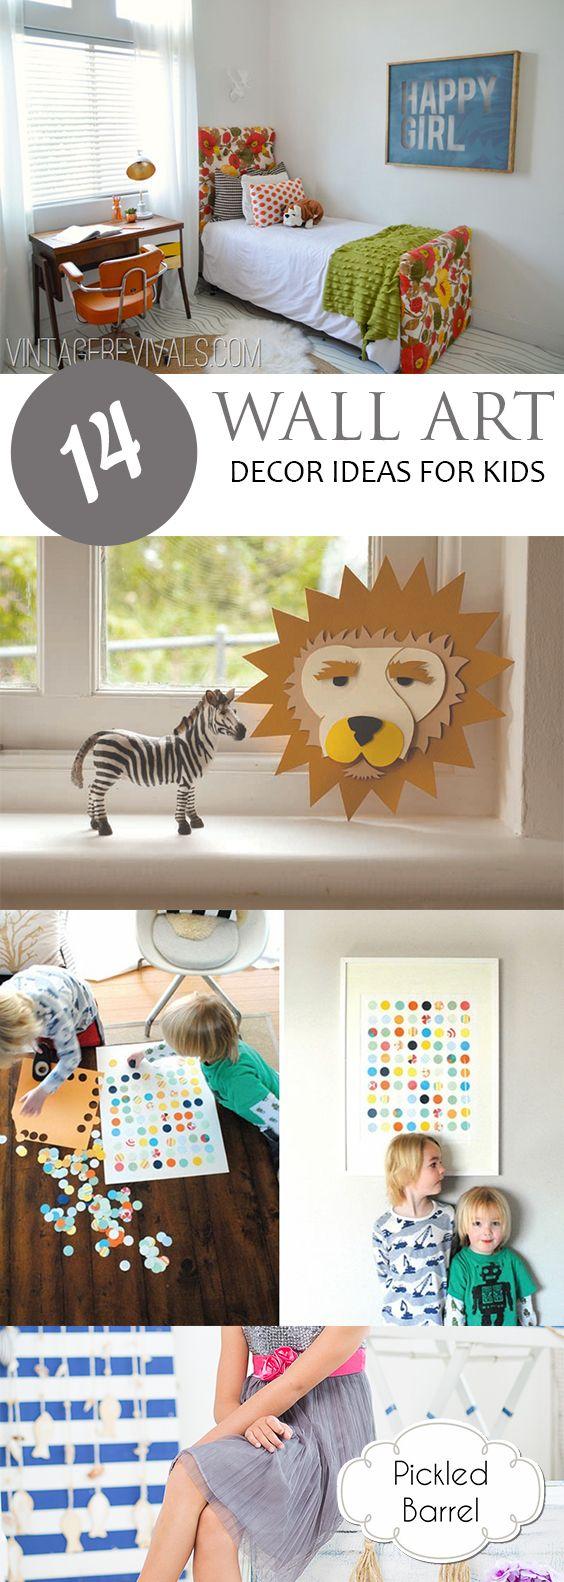 wall art decor ideas for kids family life pinterest diy